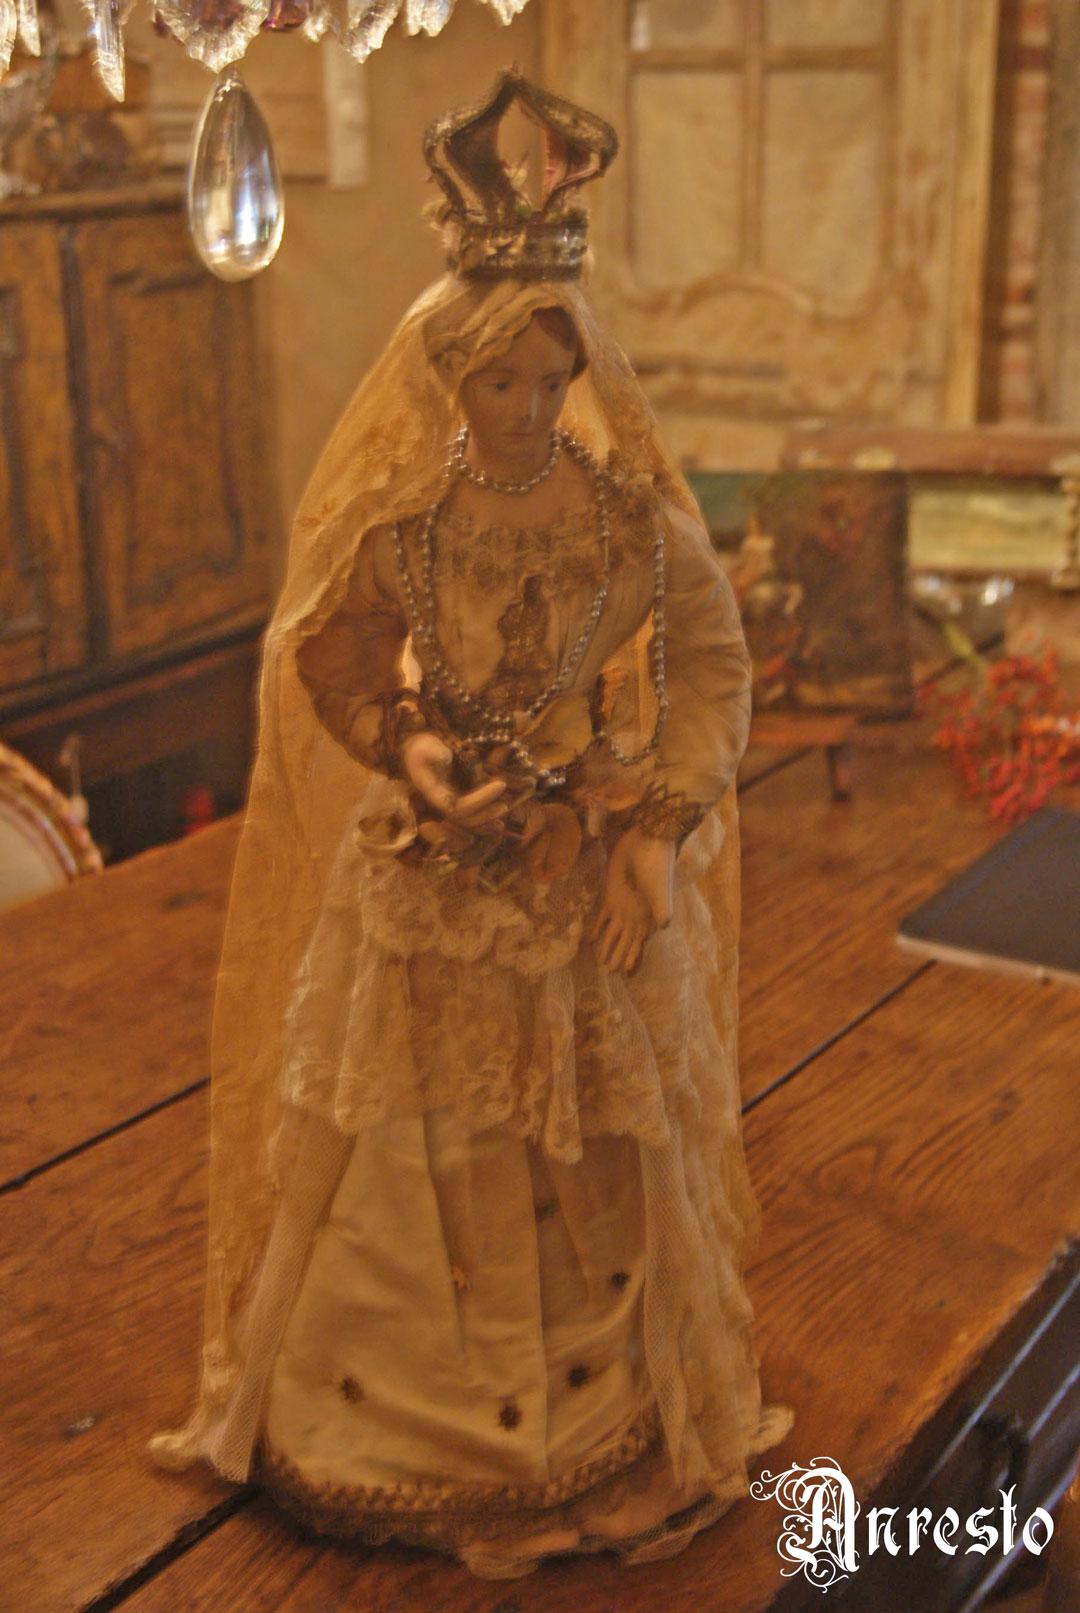 Ref. 23 - Antieke Madonna 19e eeuws